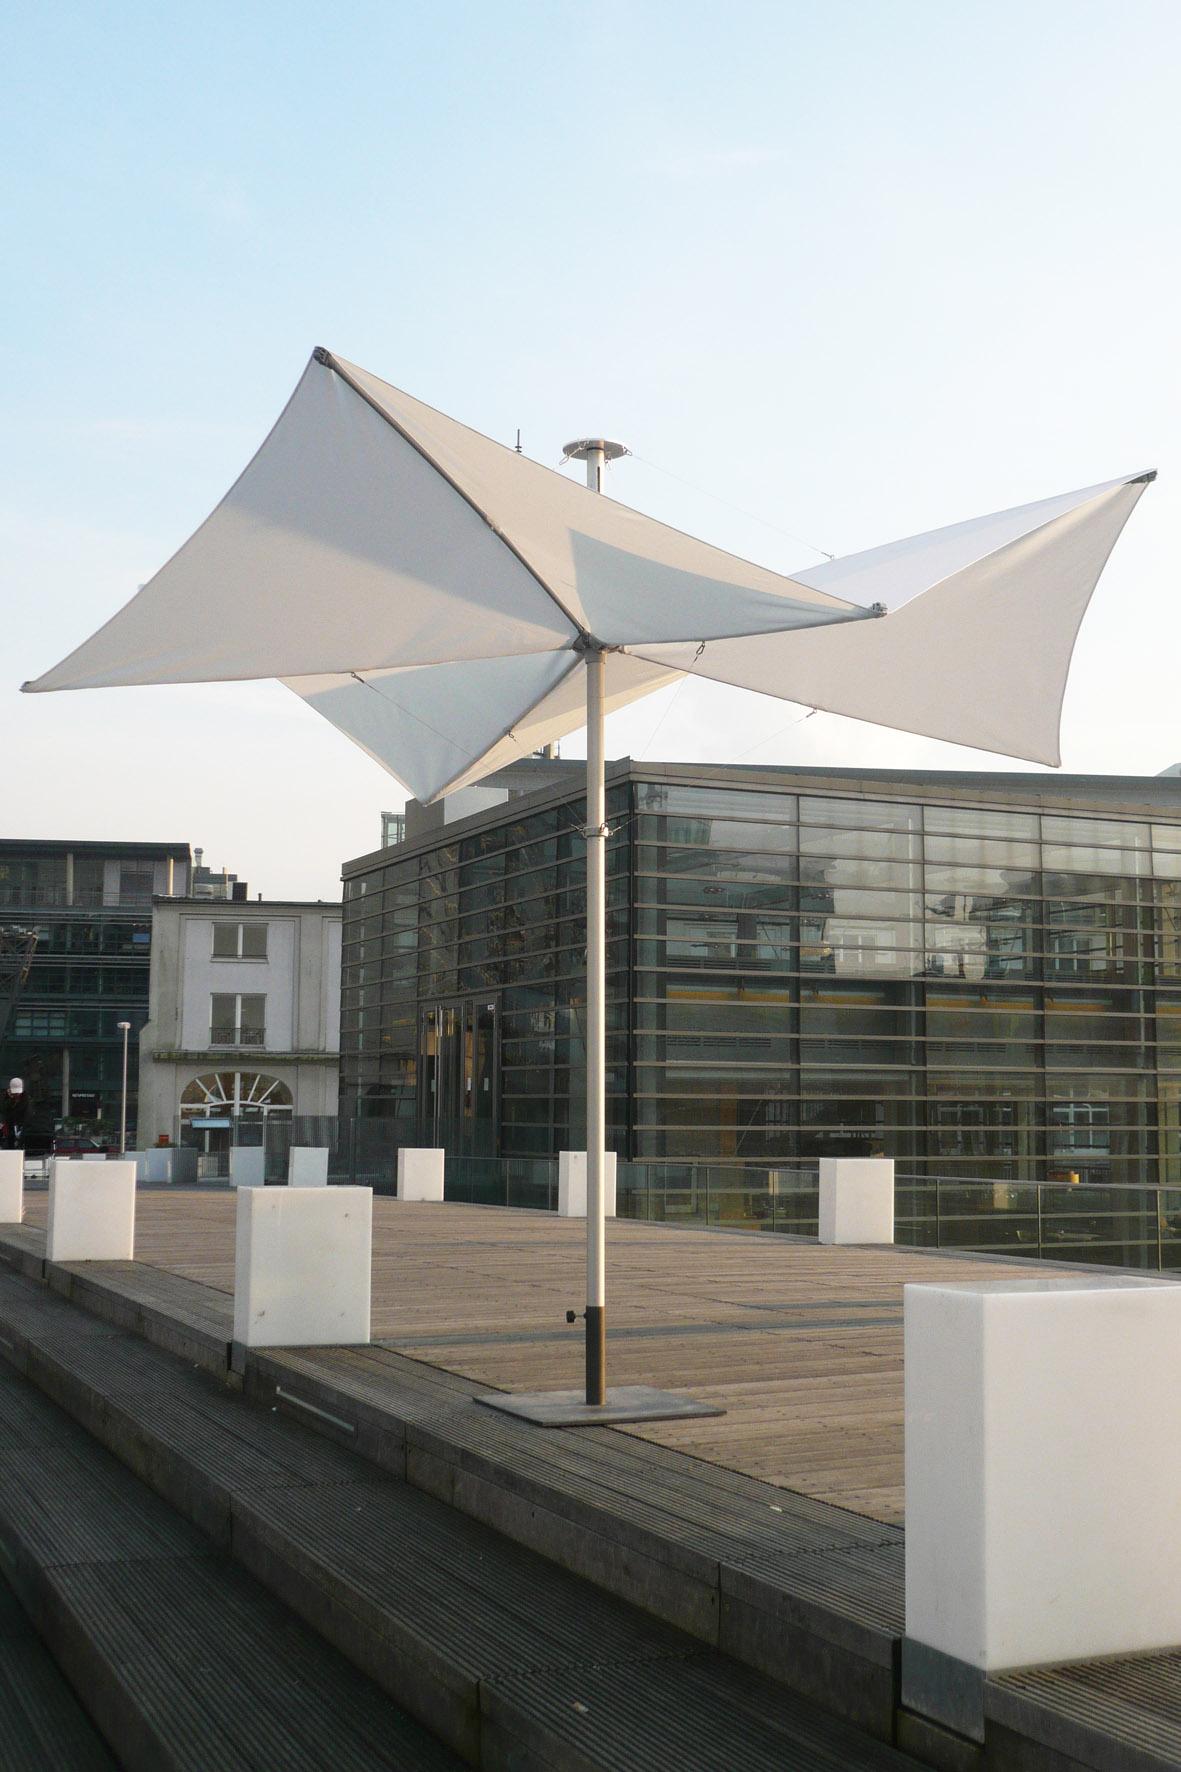 Design Sonnenschirme sonnenschirme rollomeister de